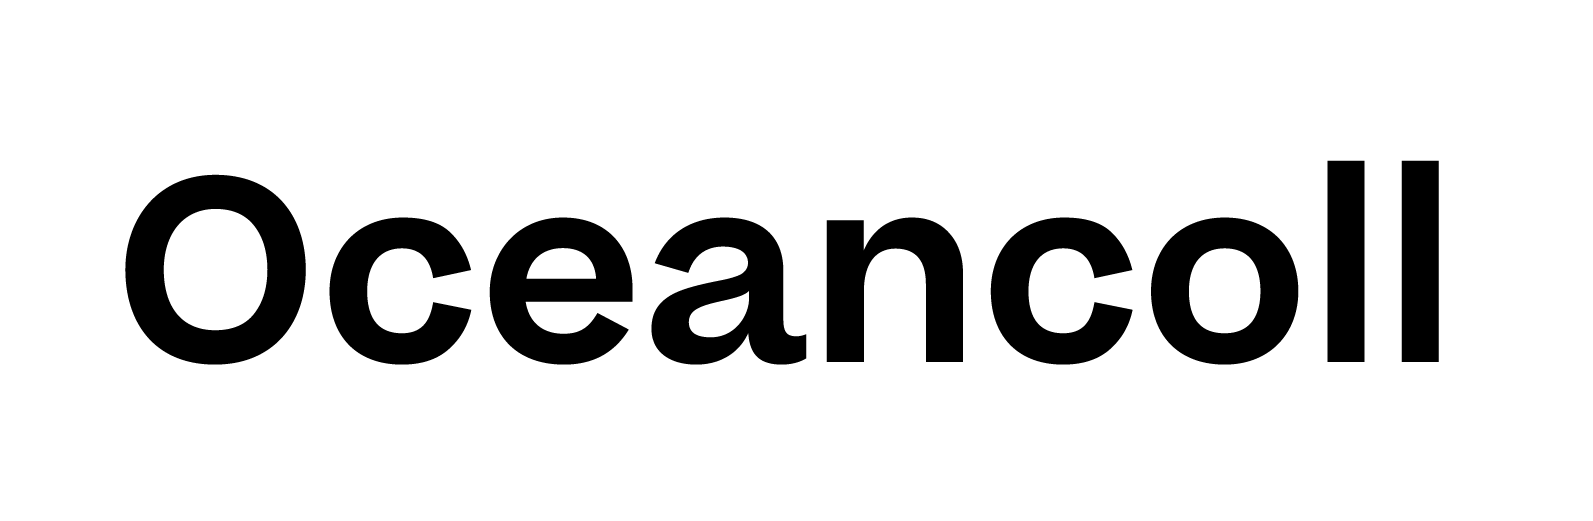 Oceancoll